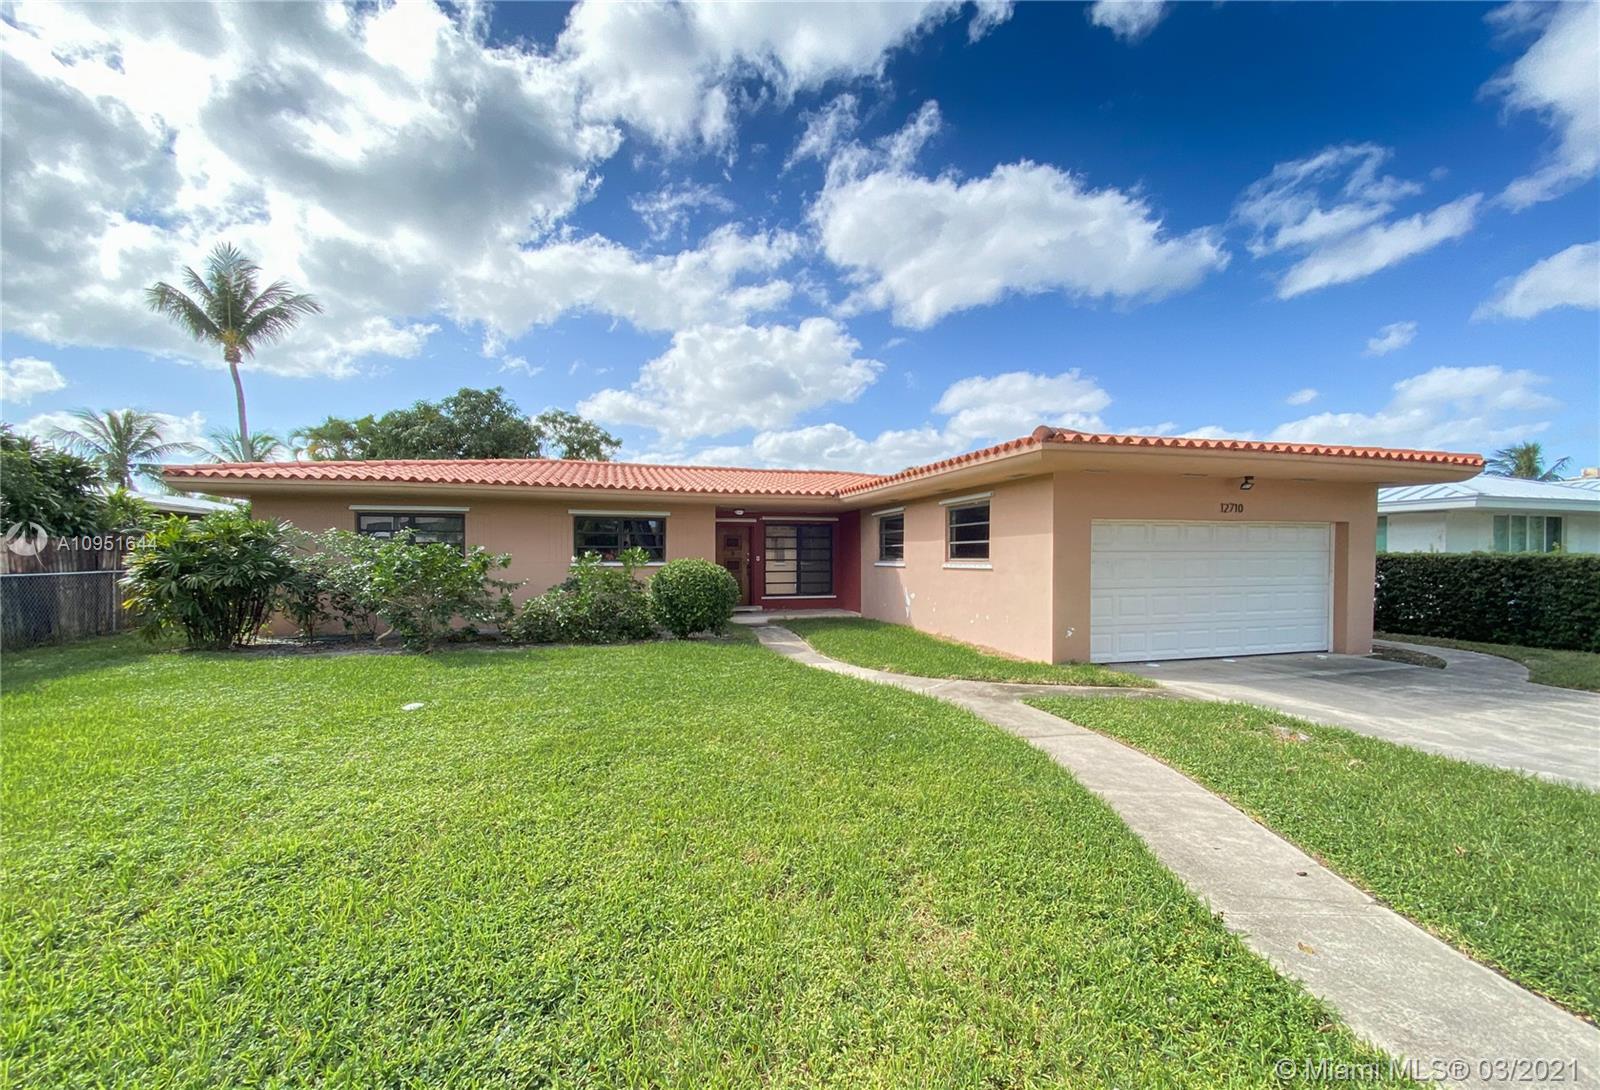 Keystone Point - 12710 Hickory Rd, North Miami, FL 33181